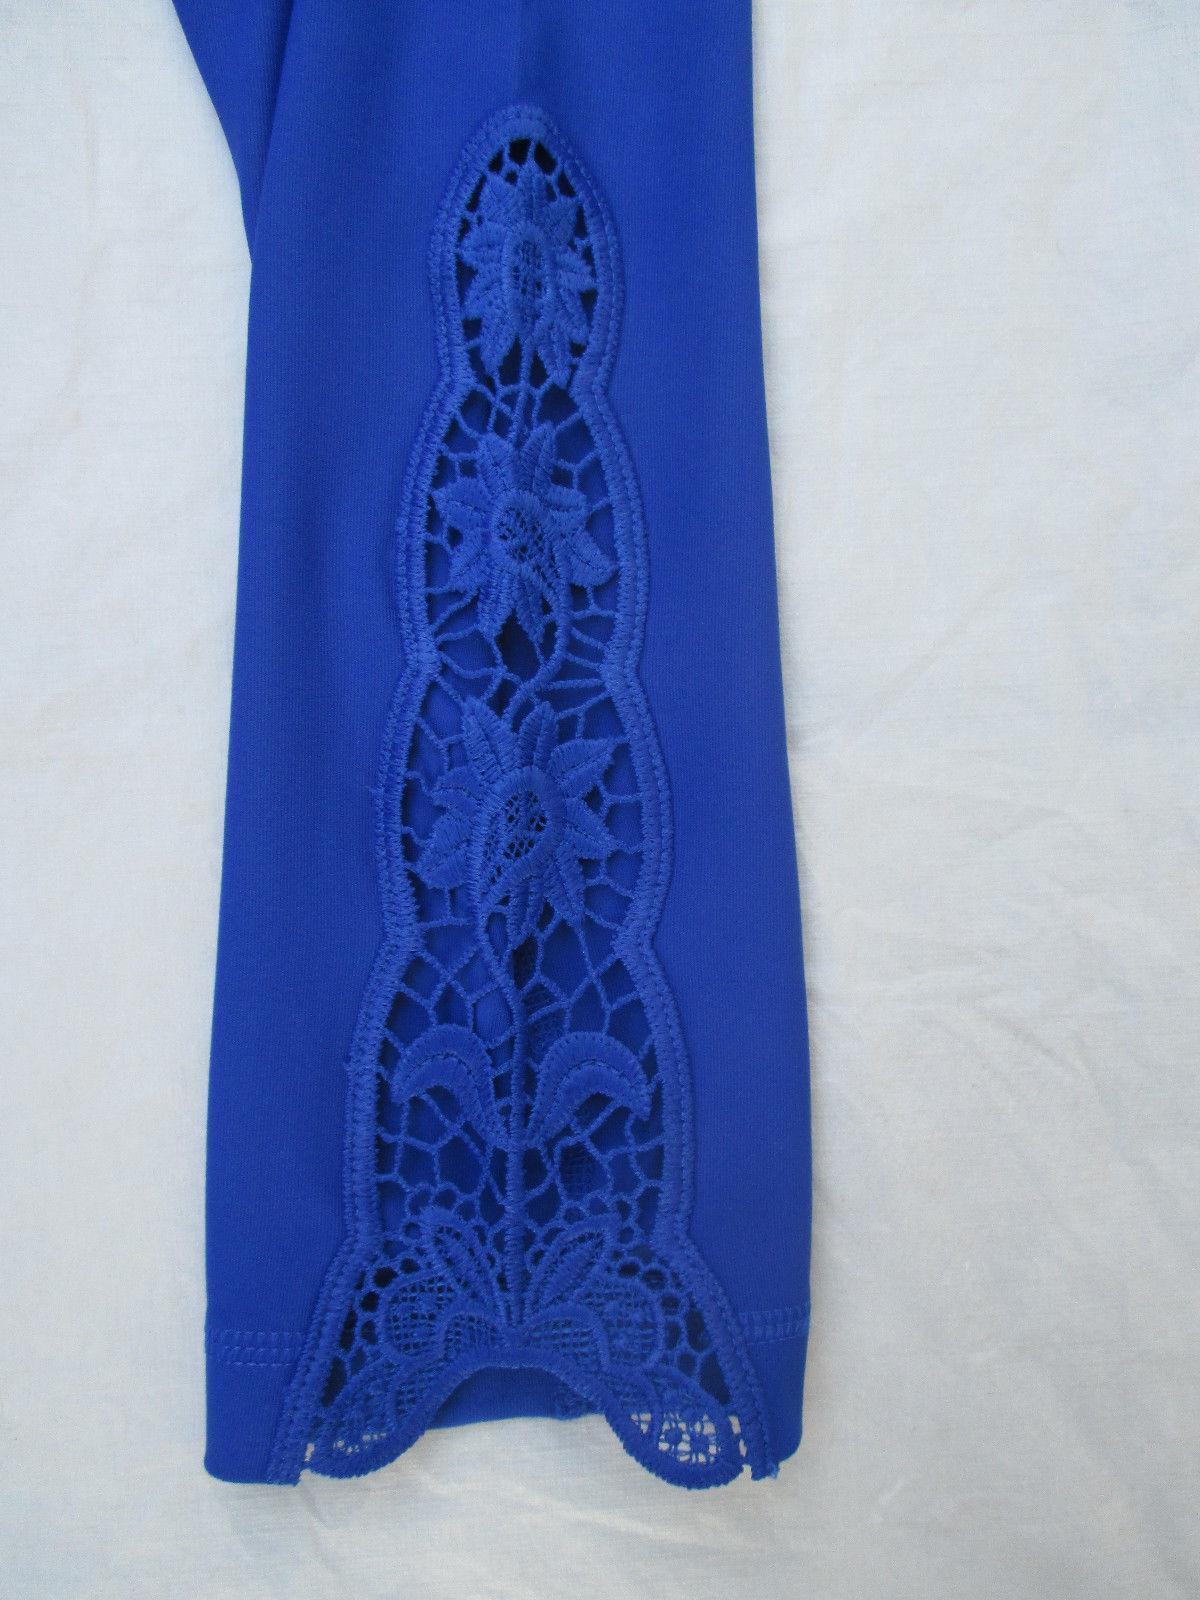 legging capri pants women cw68040 free shipping